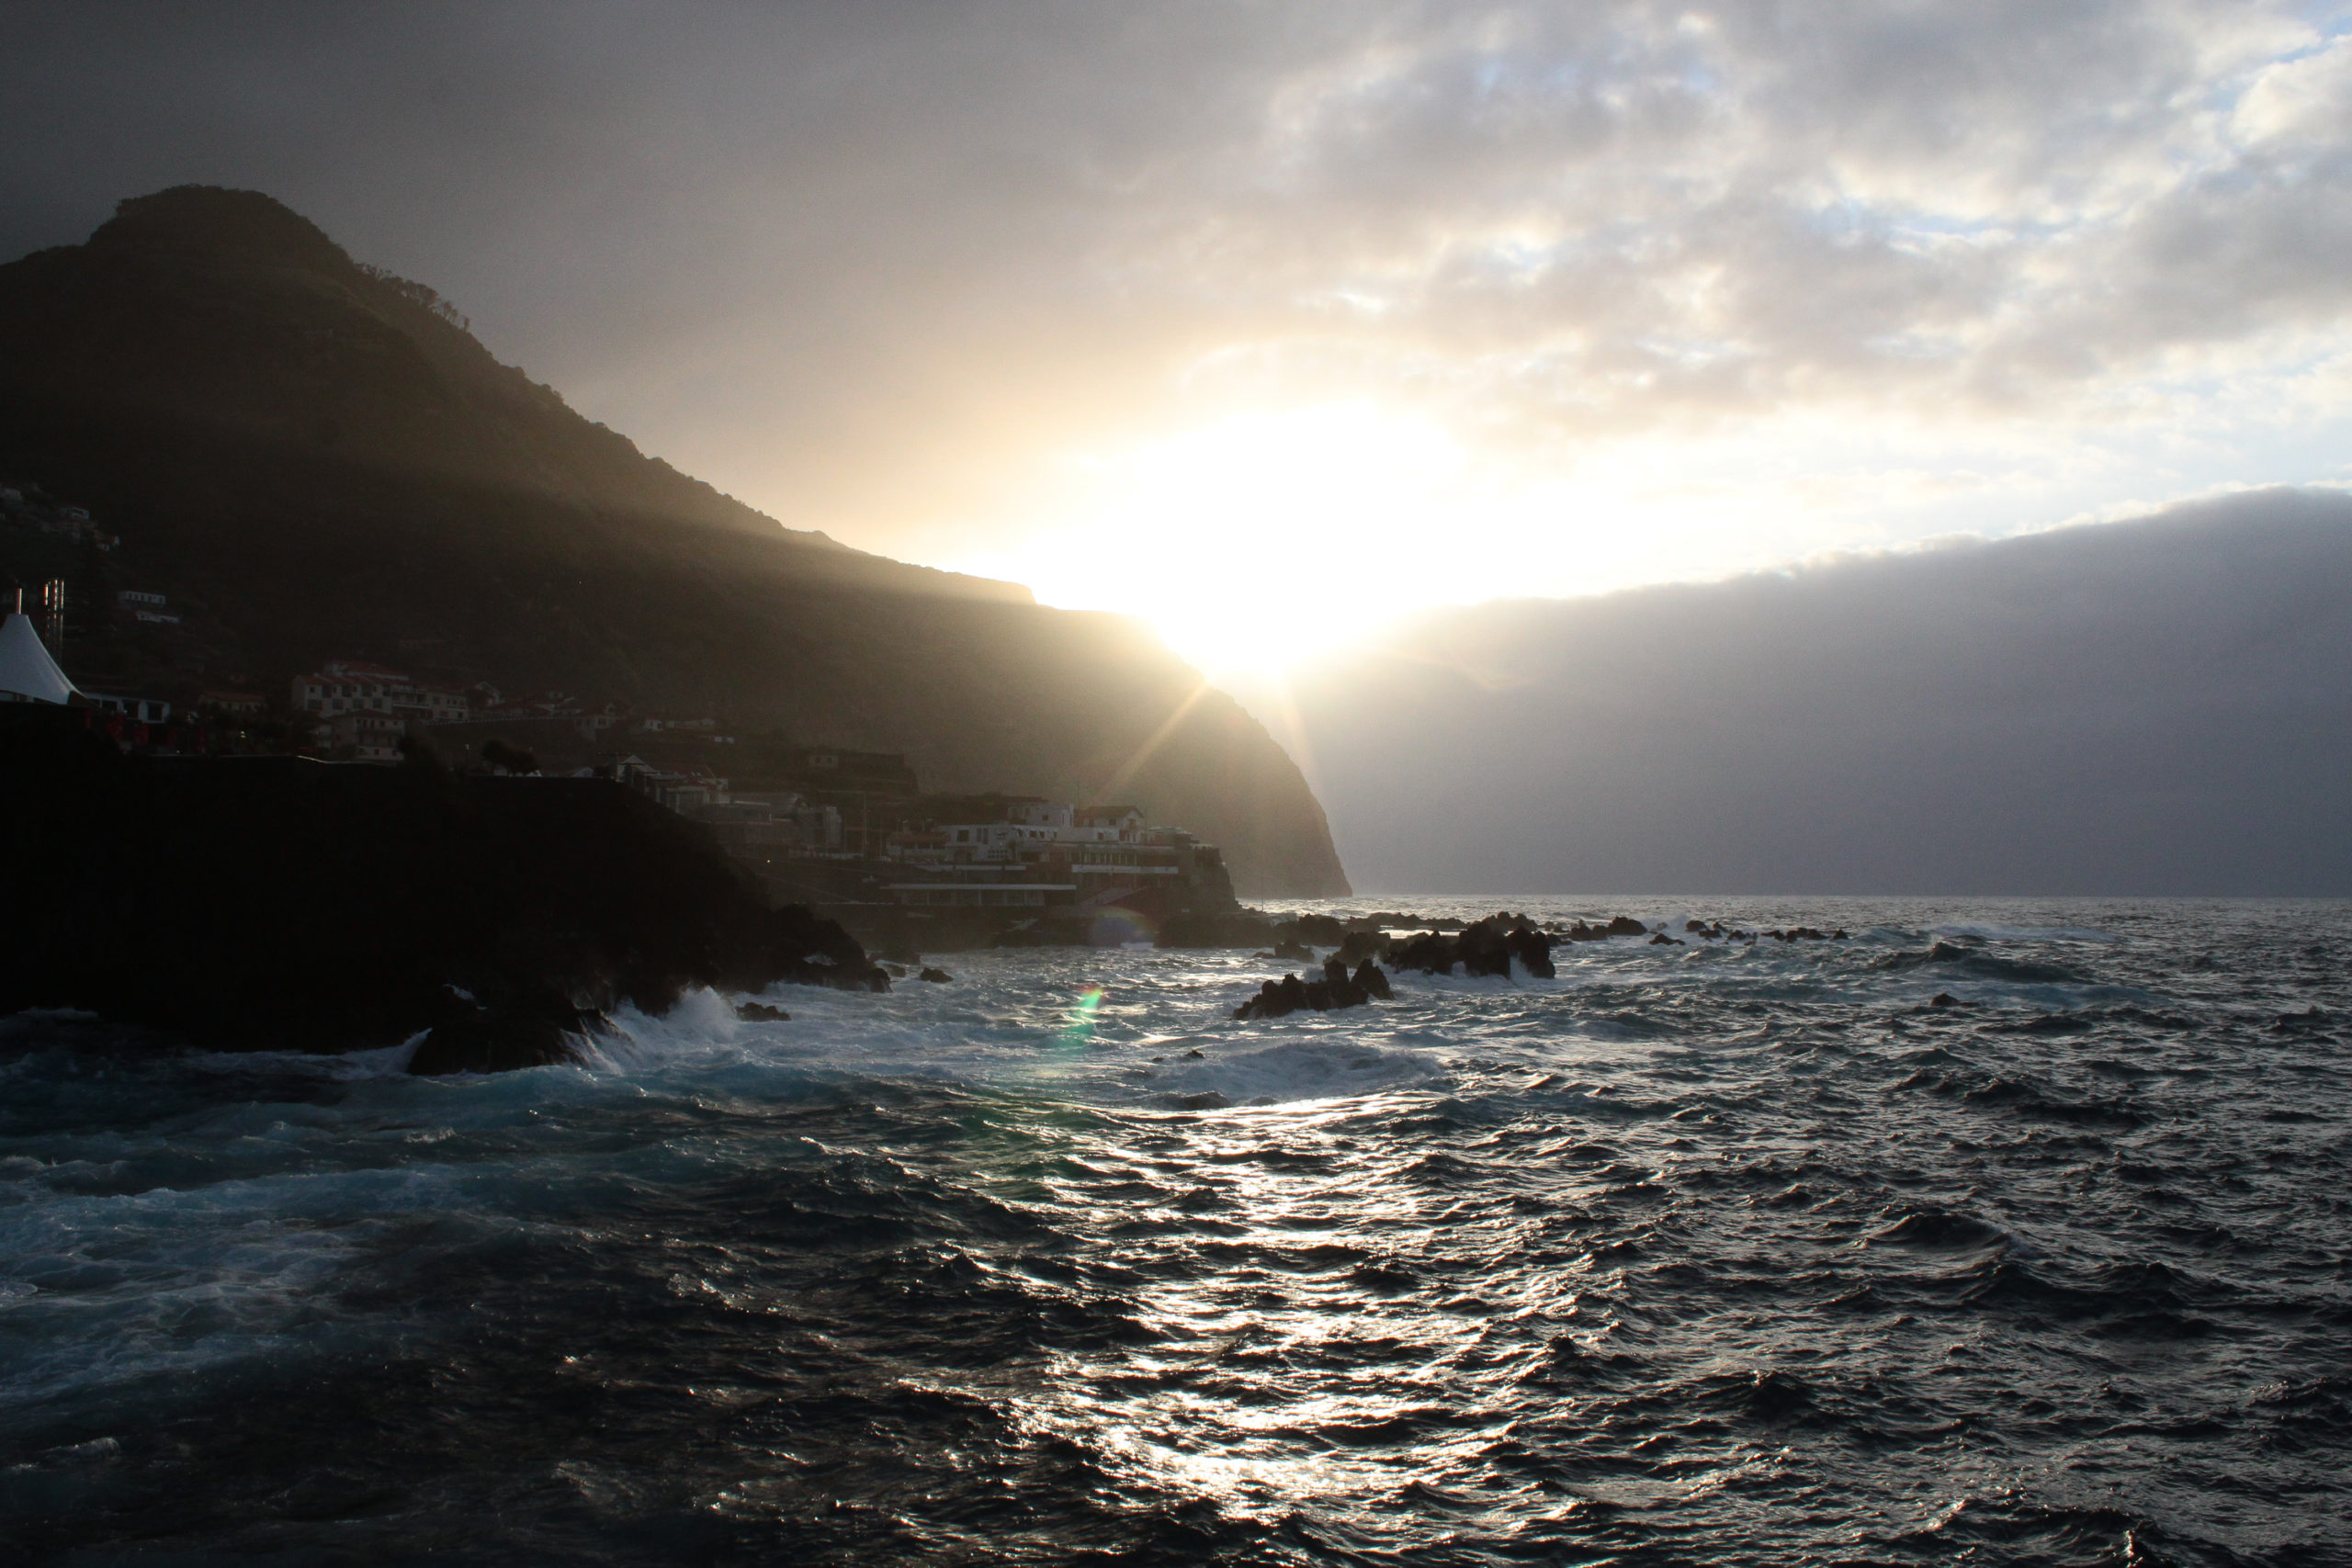 madera widok na ocean i słońce